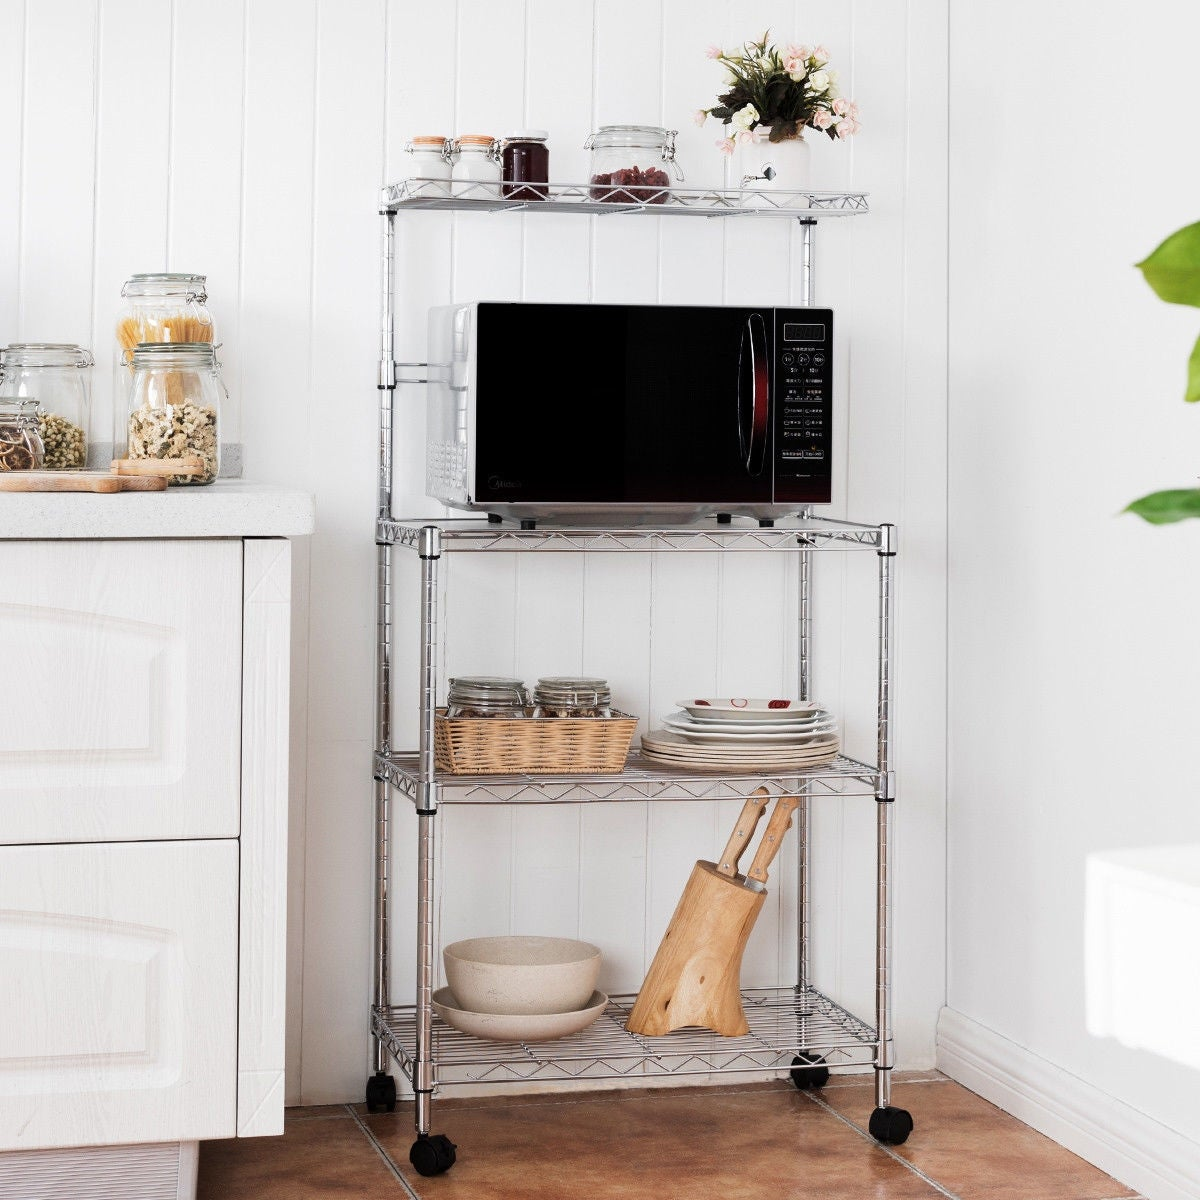 Ordinaire Shop Costway 3 Tier Kitchen Bakeru0027s Rack Microwave Oven Stand Storage Cart  Workstation Shelf   Sliver   Free Shipping Today   Overstock.com   15897993